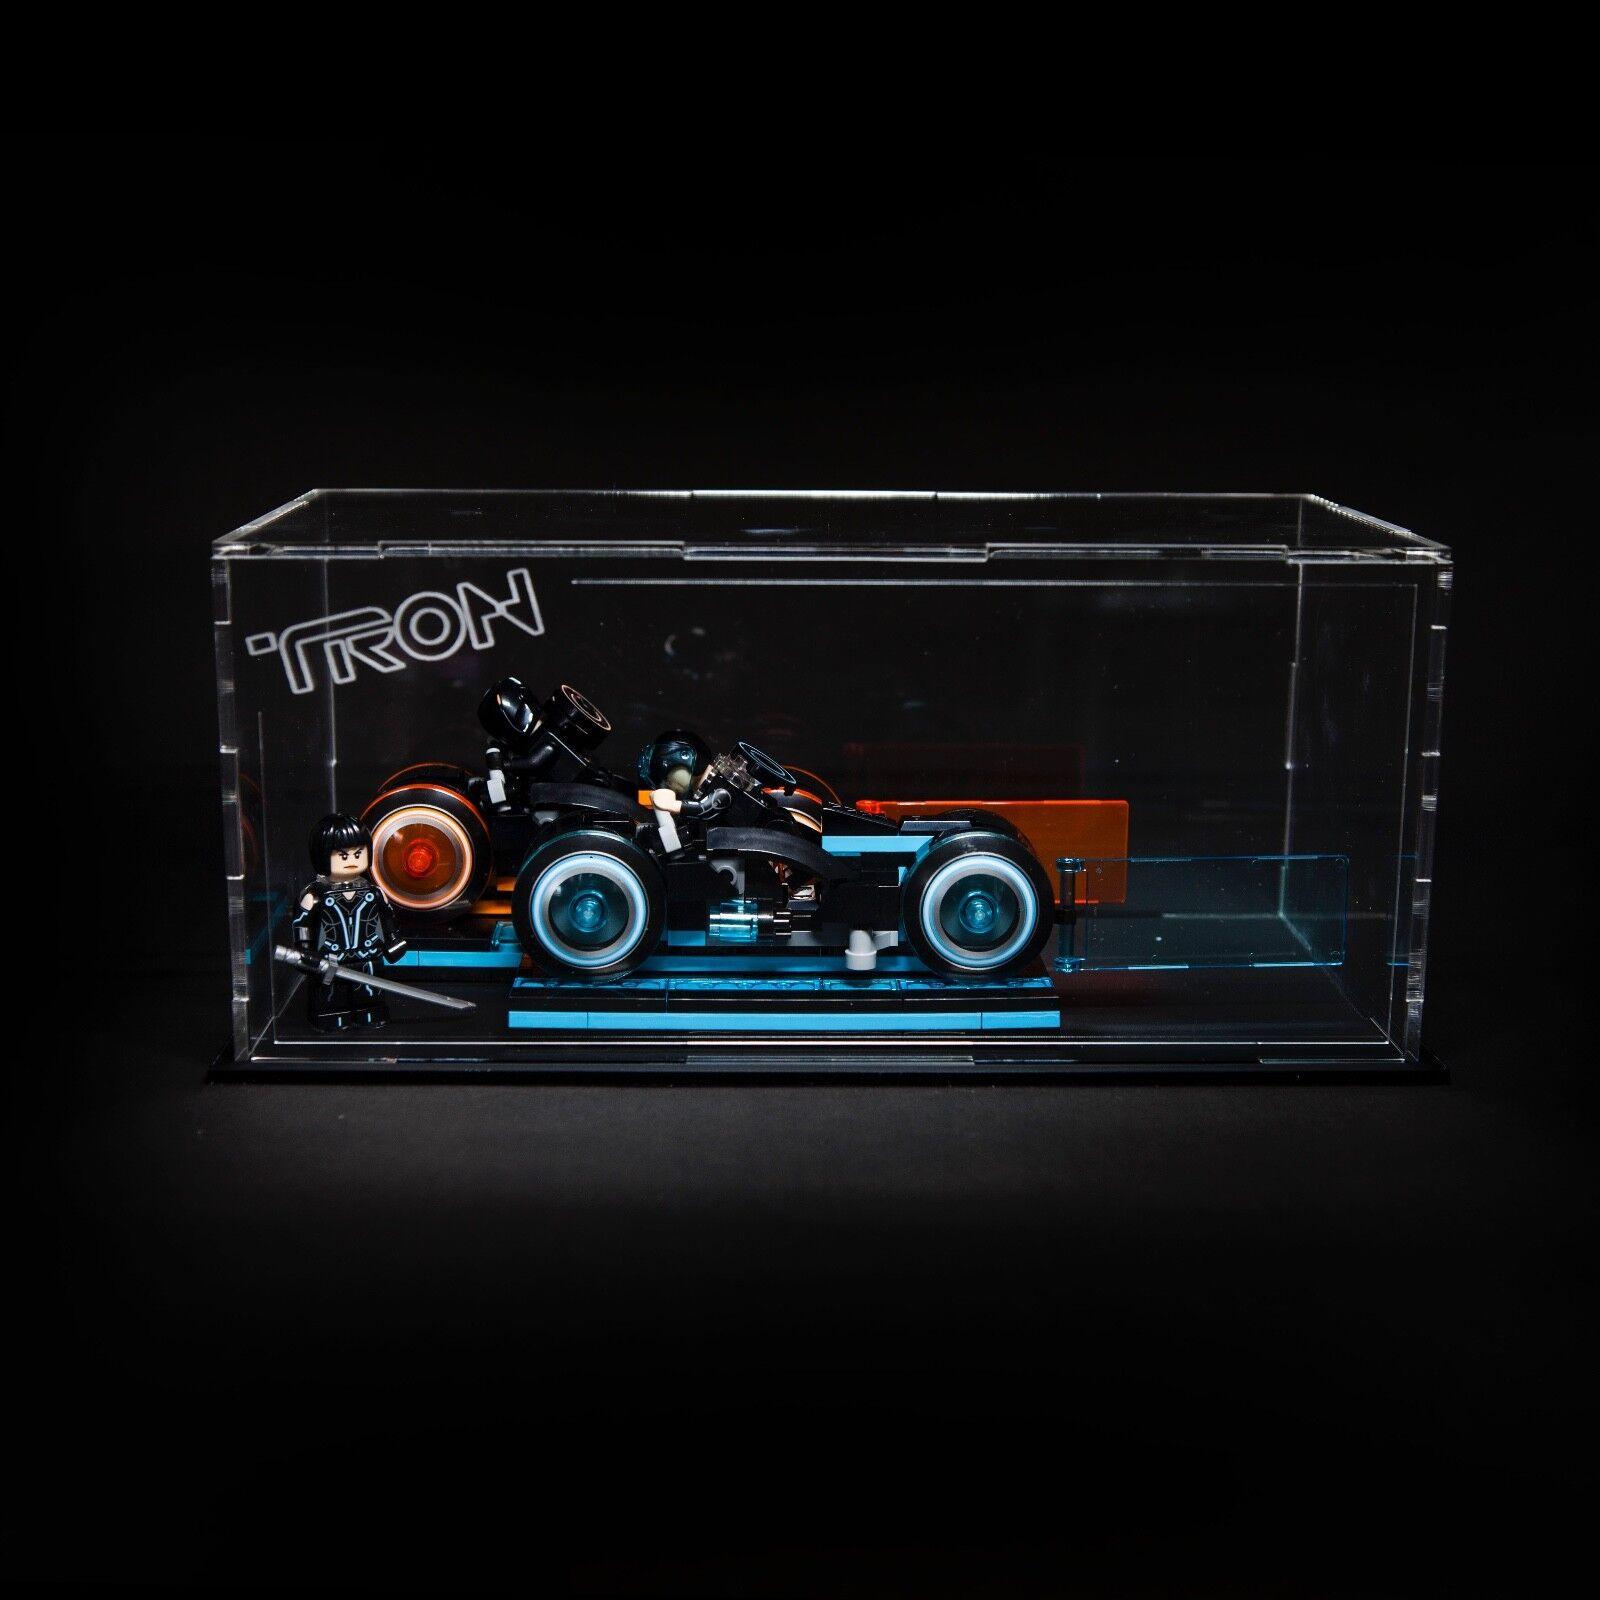 Tron Legacy acrylic display case for Lego set (21314)